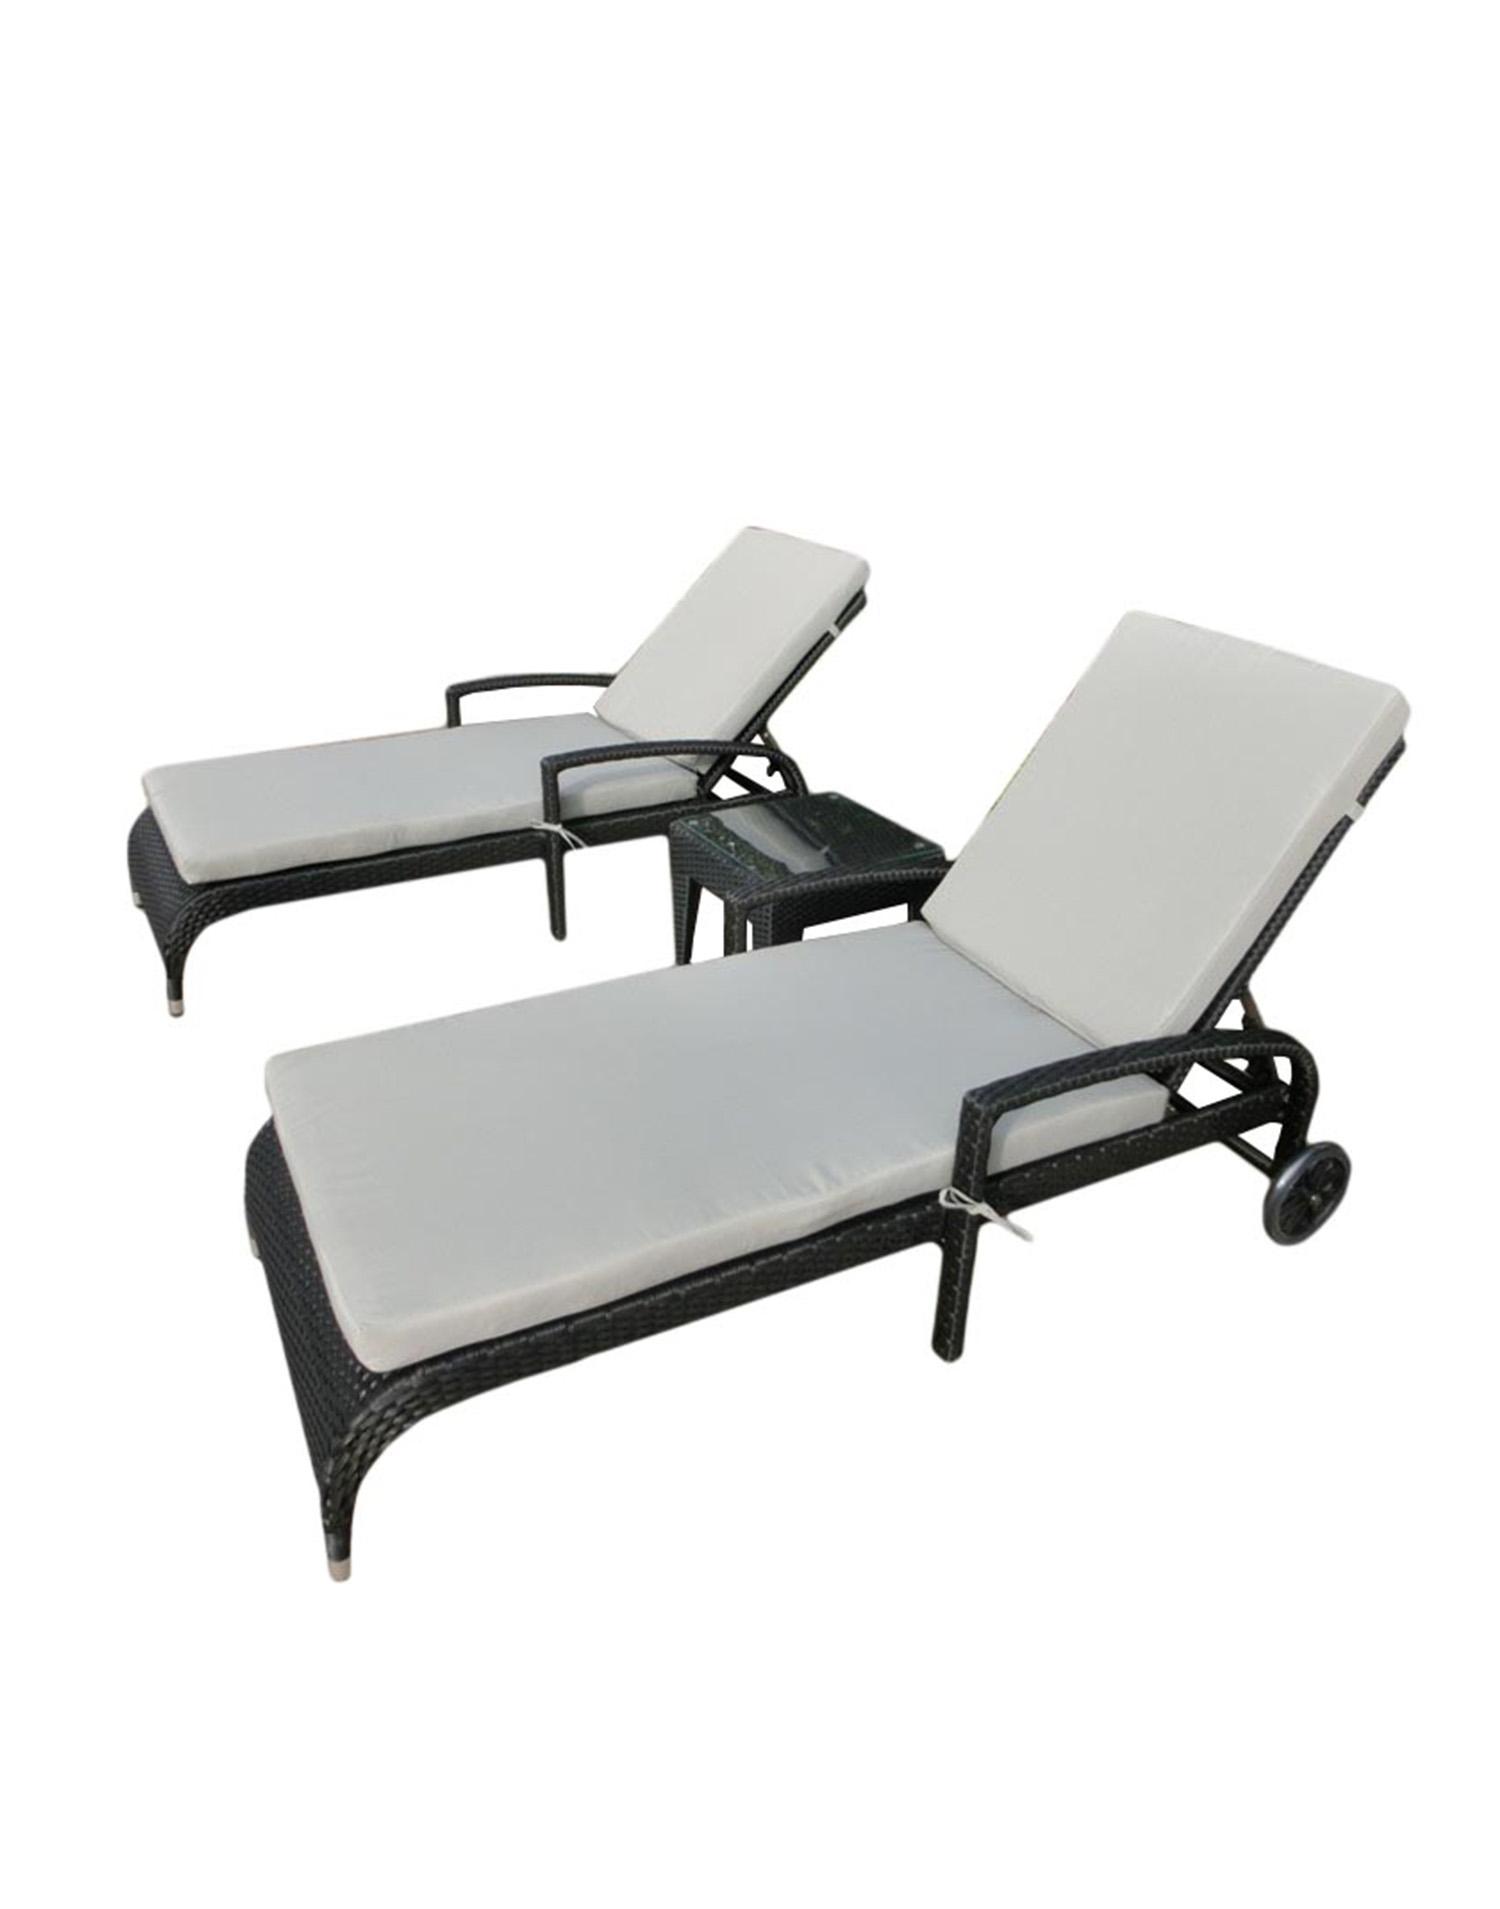 rattanliege la jolla. Black Bedroom Furniture Sets. Home Design Ideas